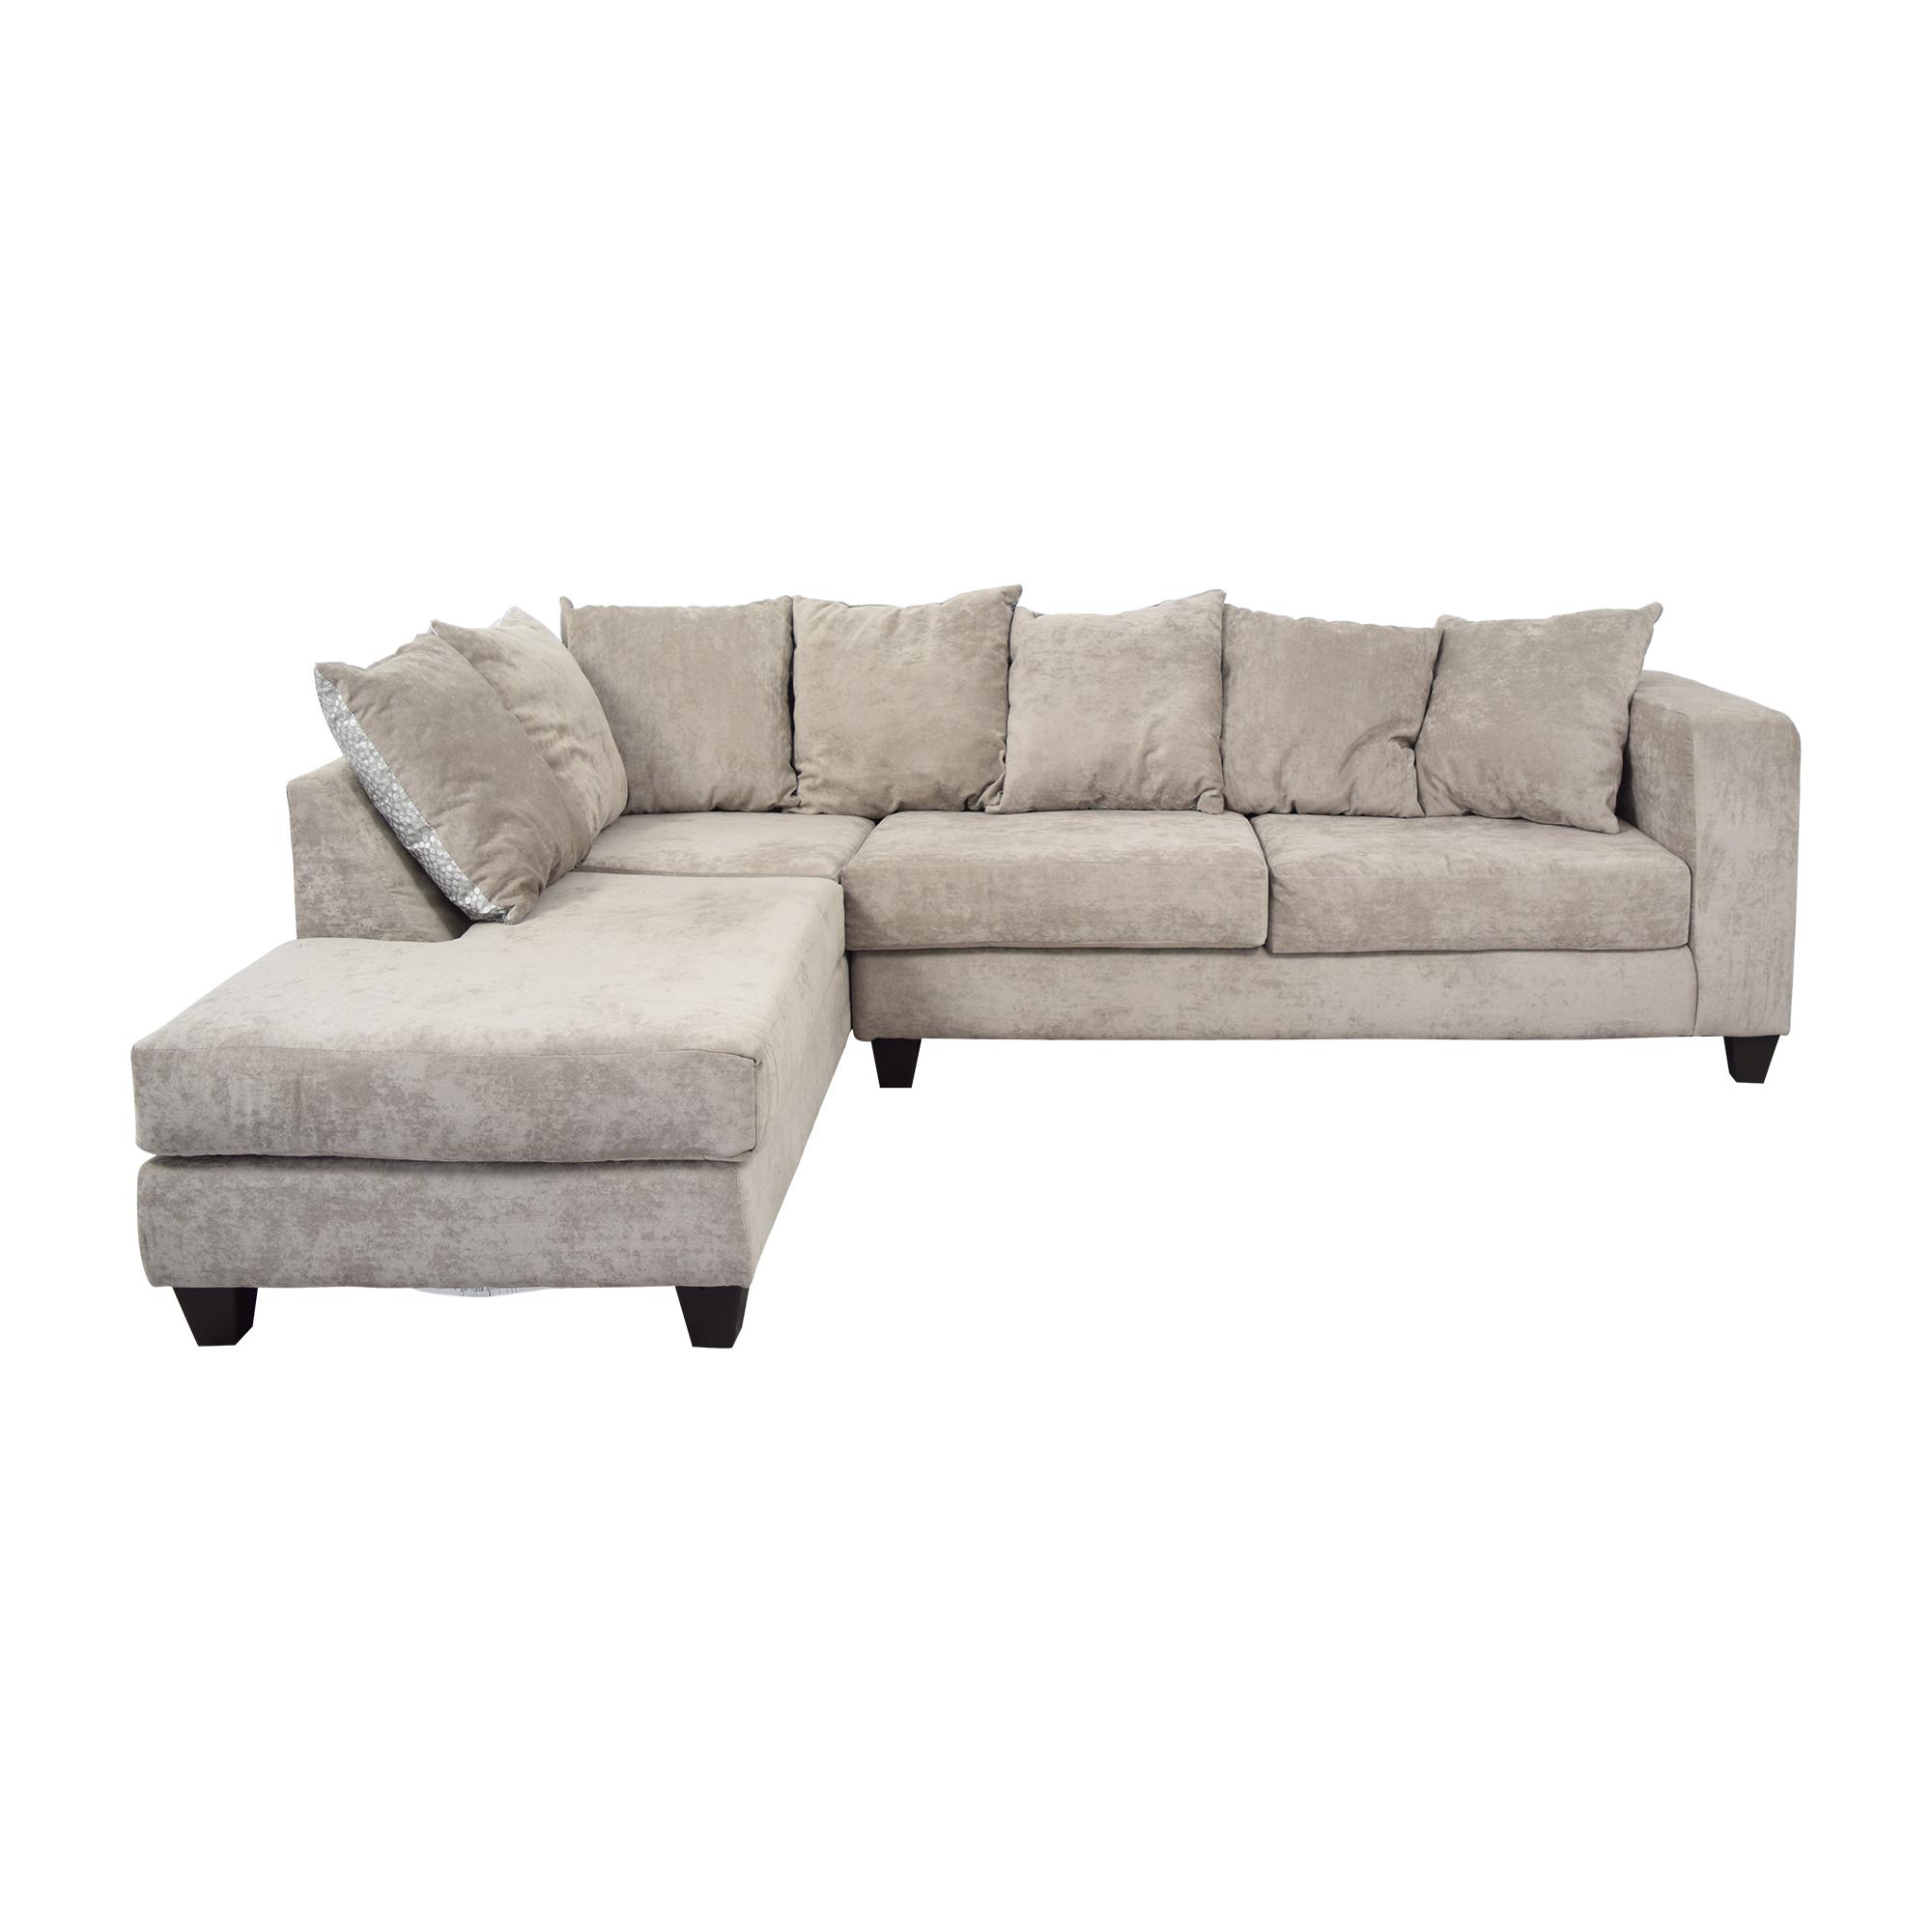 Raymour & Flanigan Raymour & Flanigan Whitney Two Piece Sectional Sofa pa